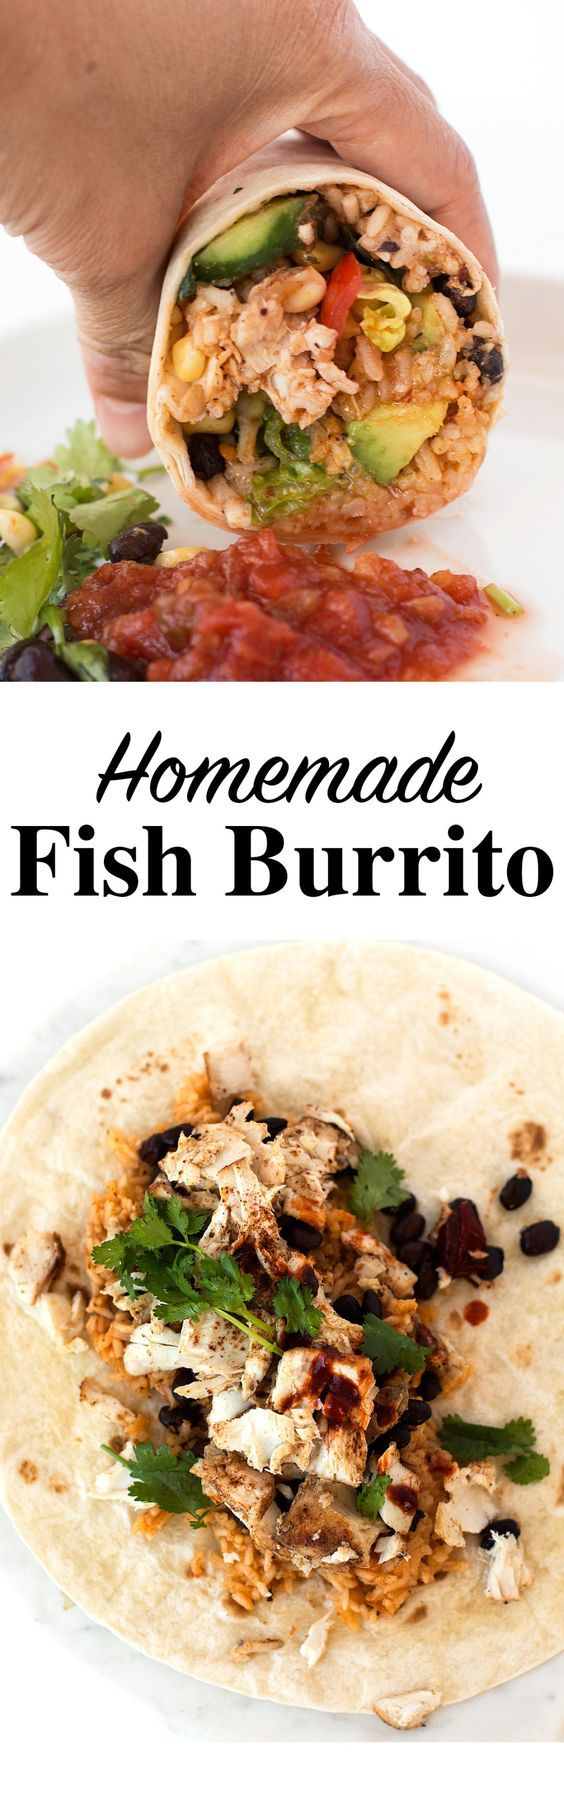 Wahoo Fish Burrito with Pineapple Salsa 45 mins to make